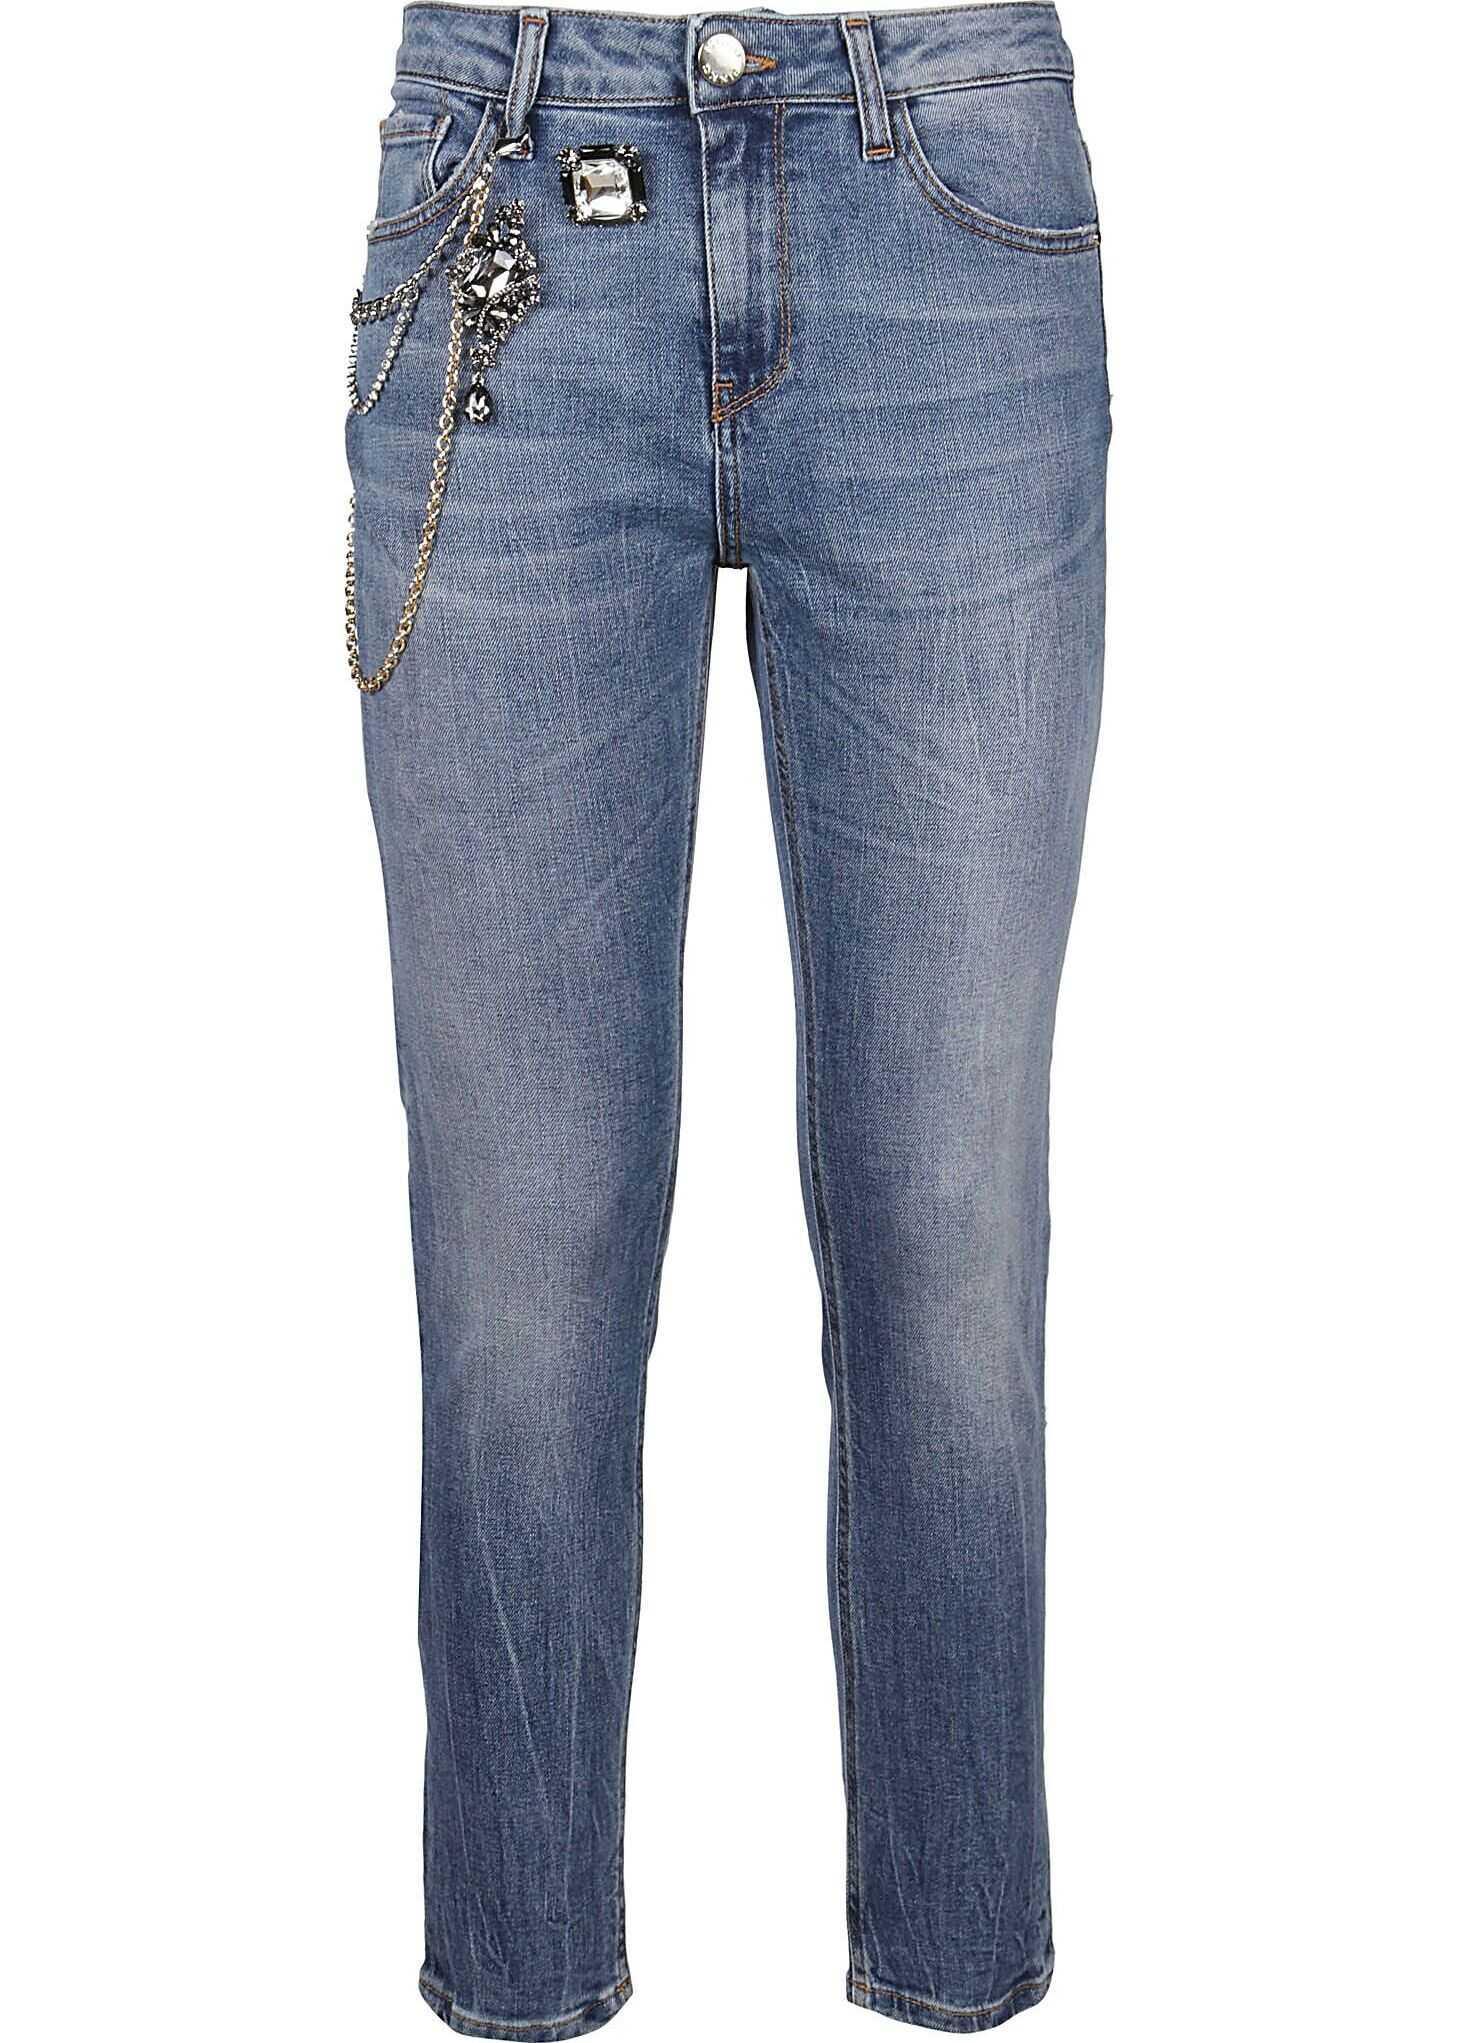 Pinko Cotton Jeans BLUE